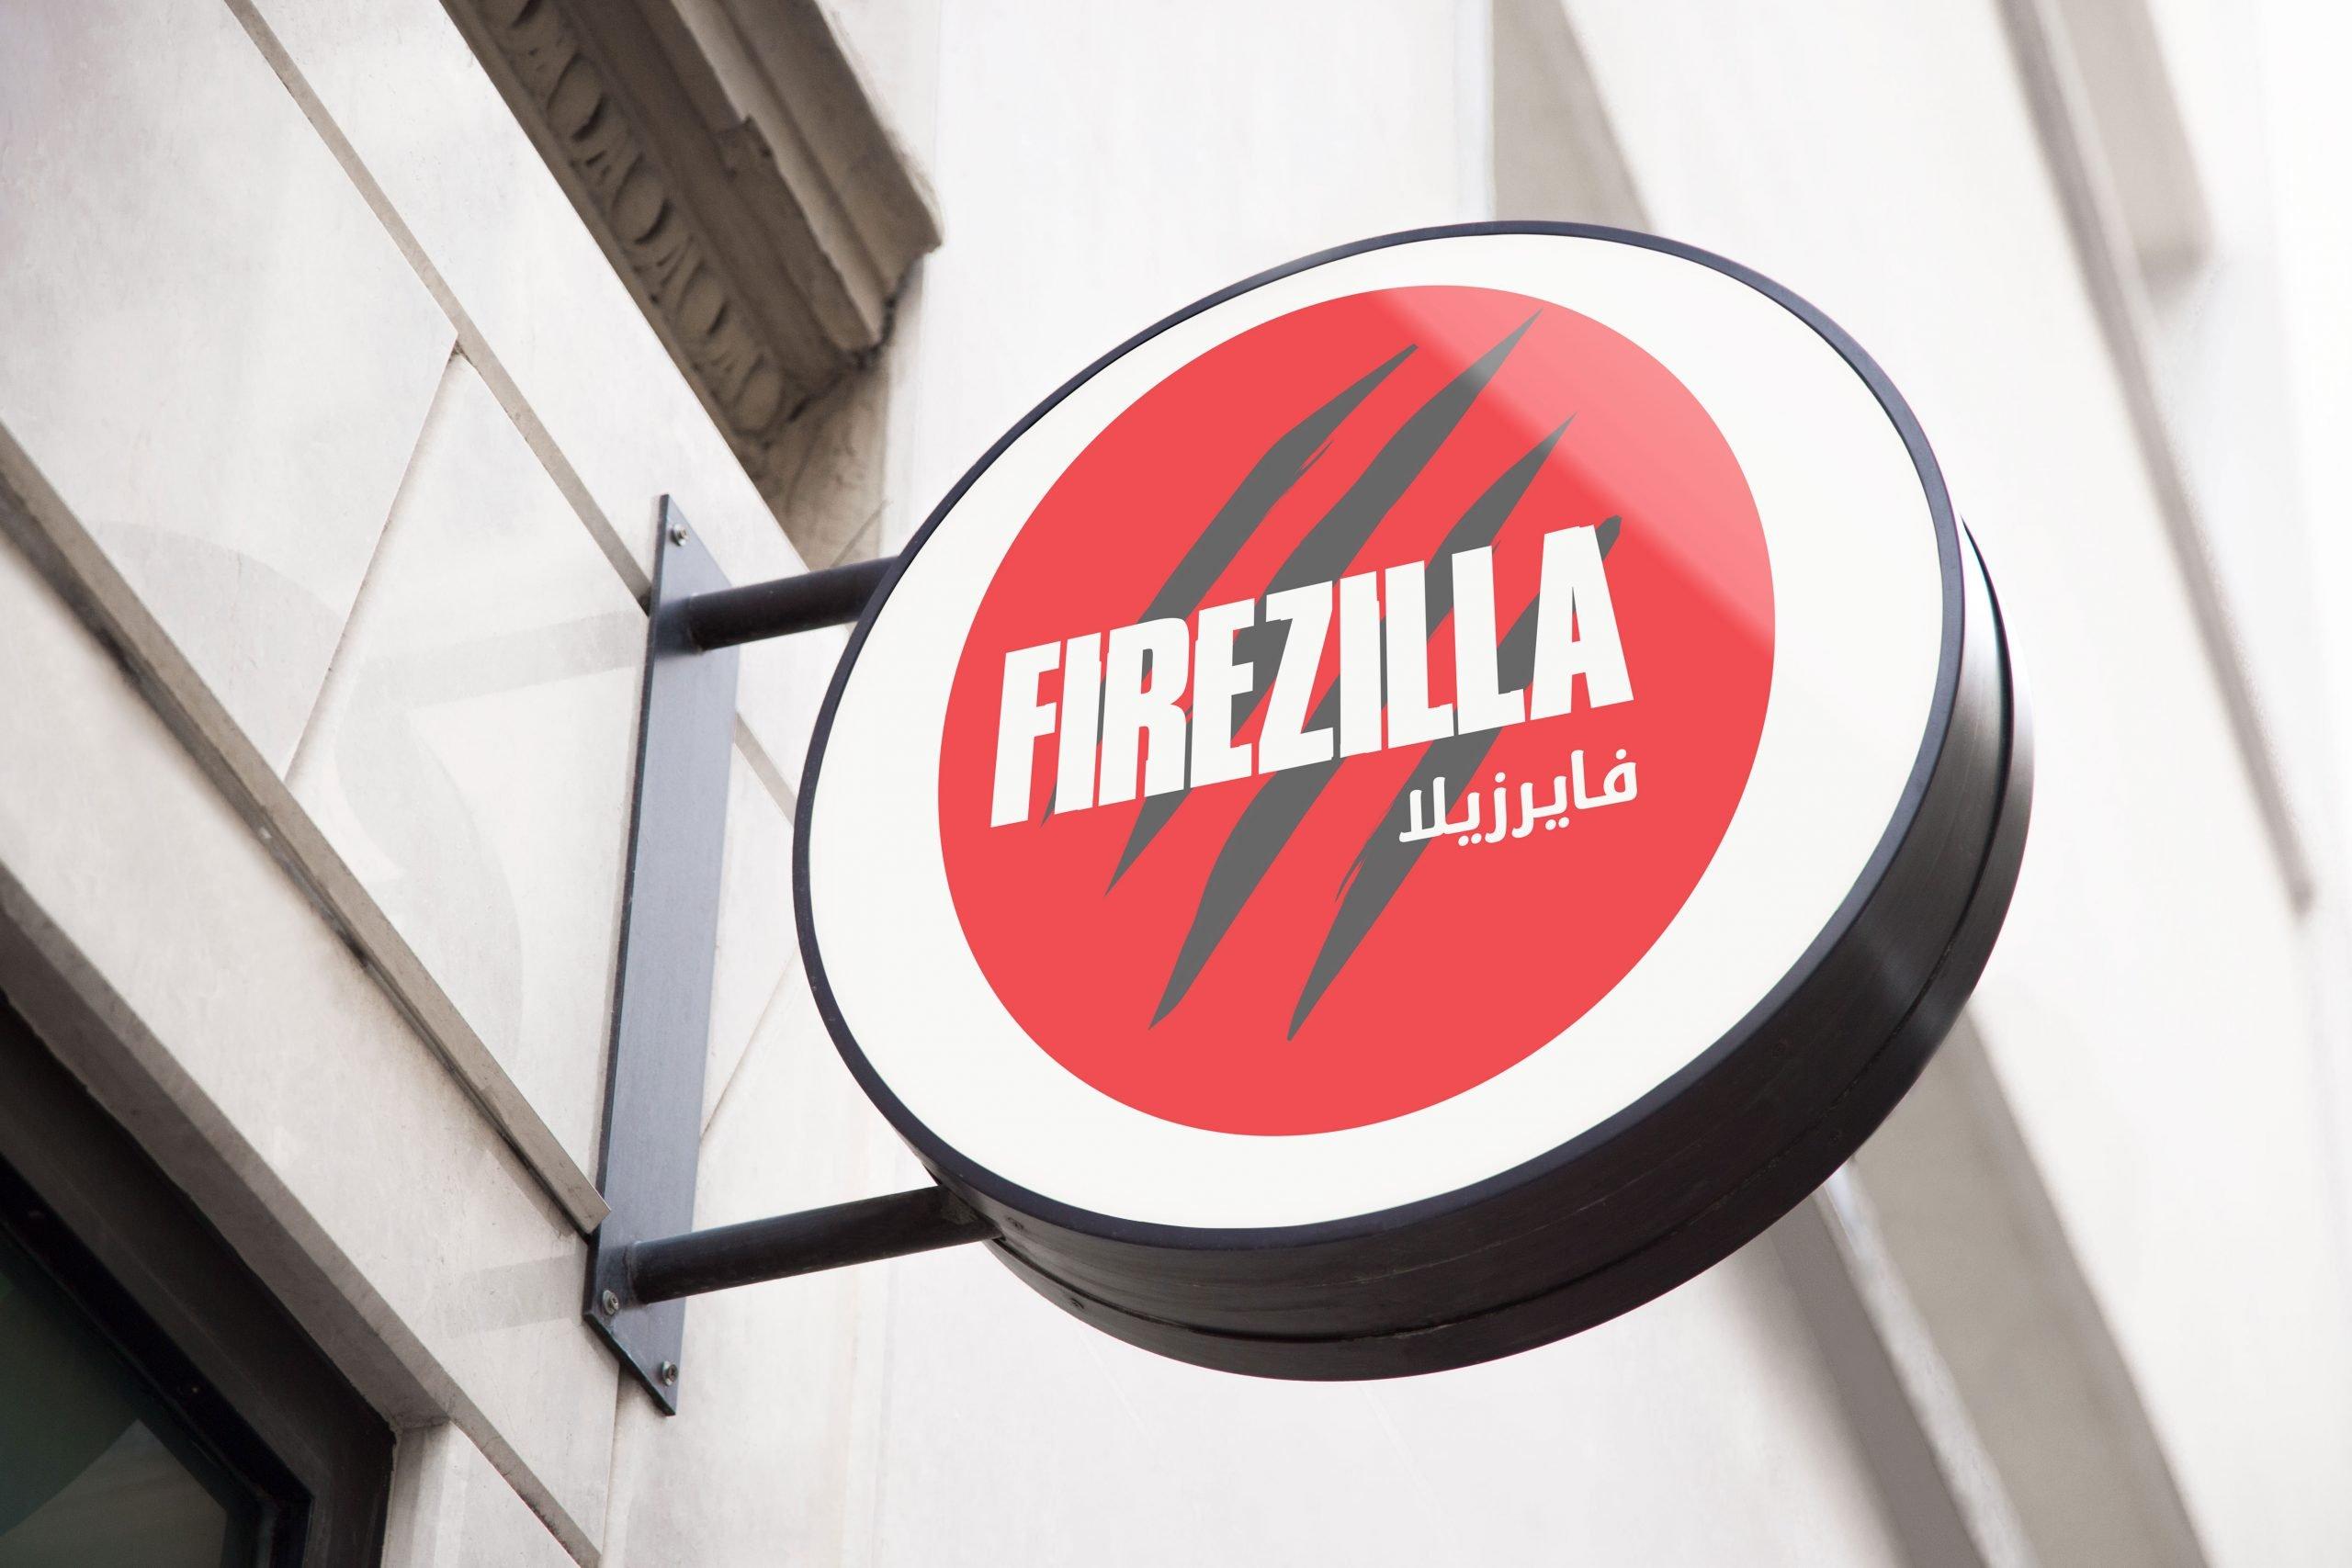 Firezilla Store Front Sign